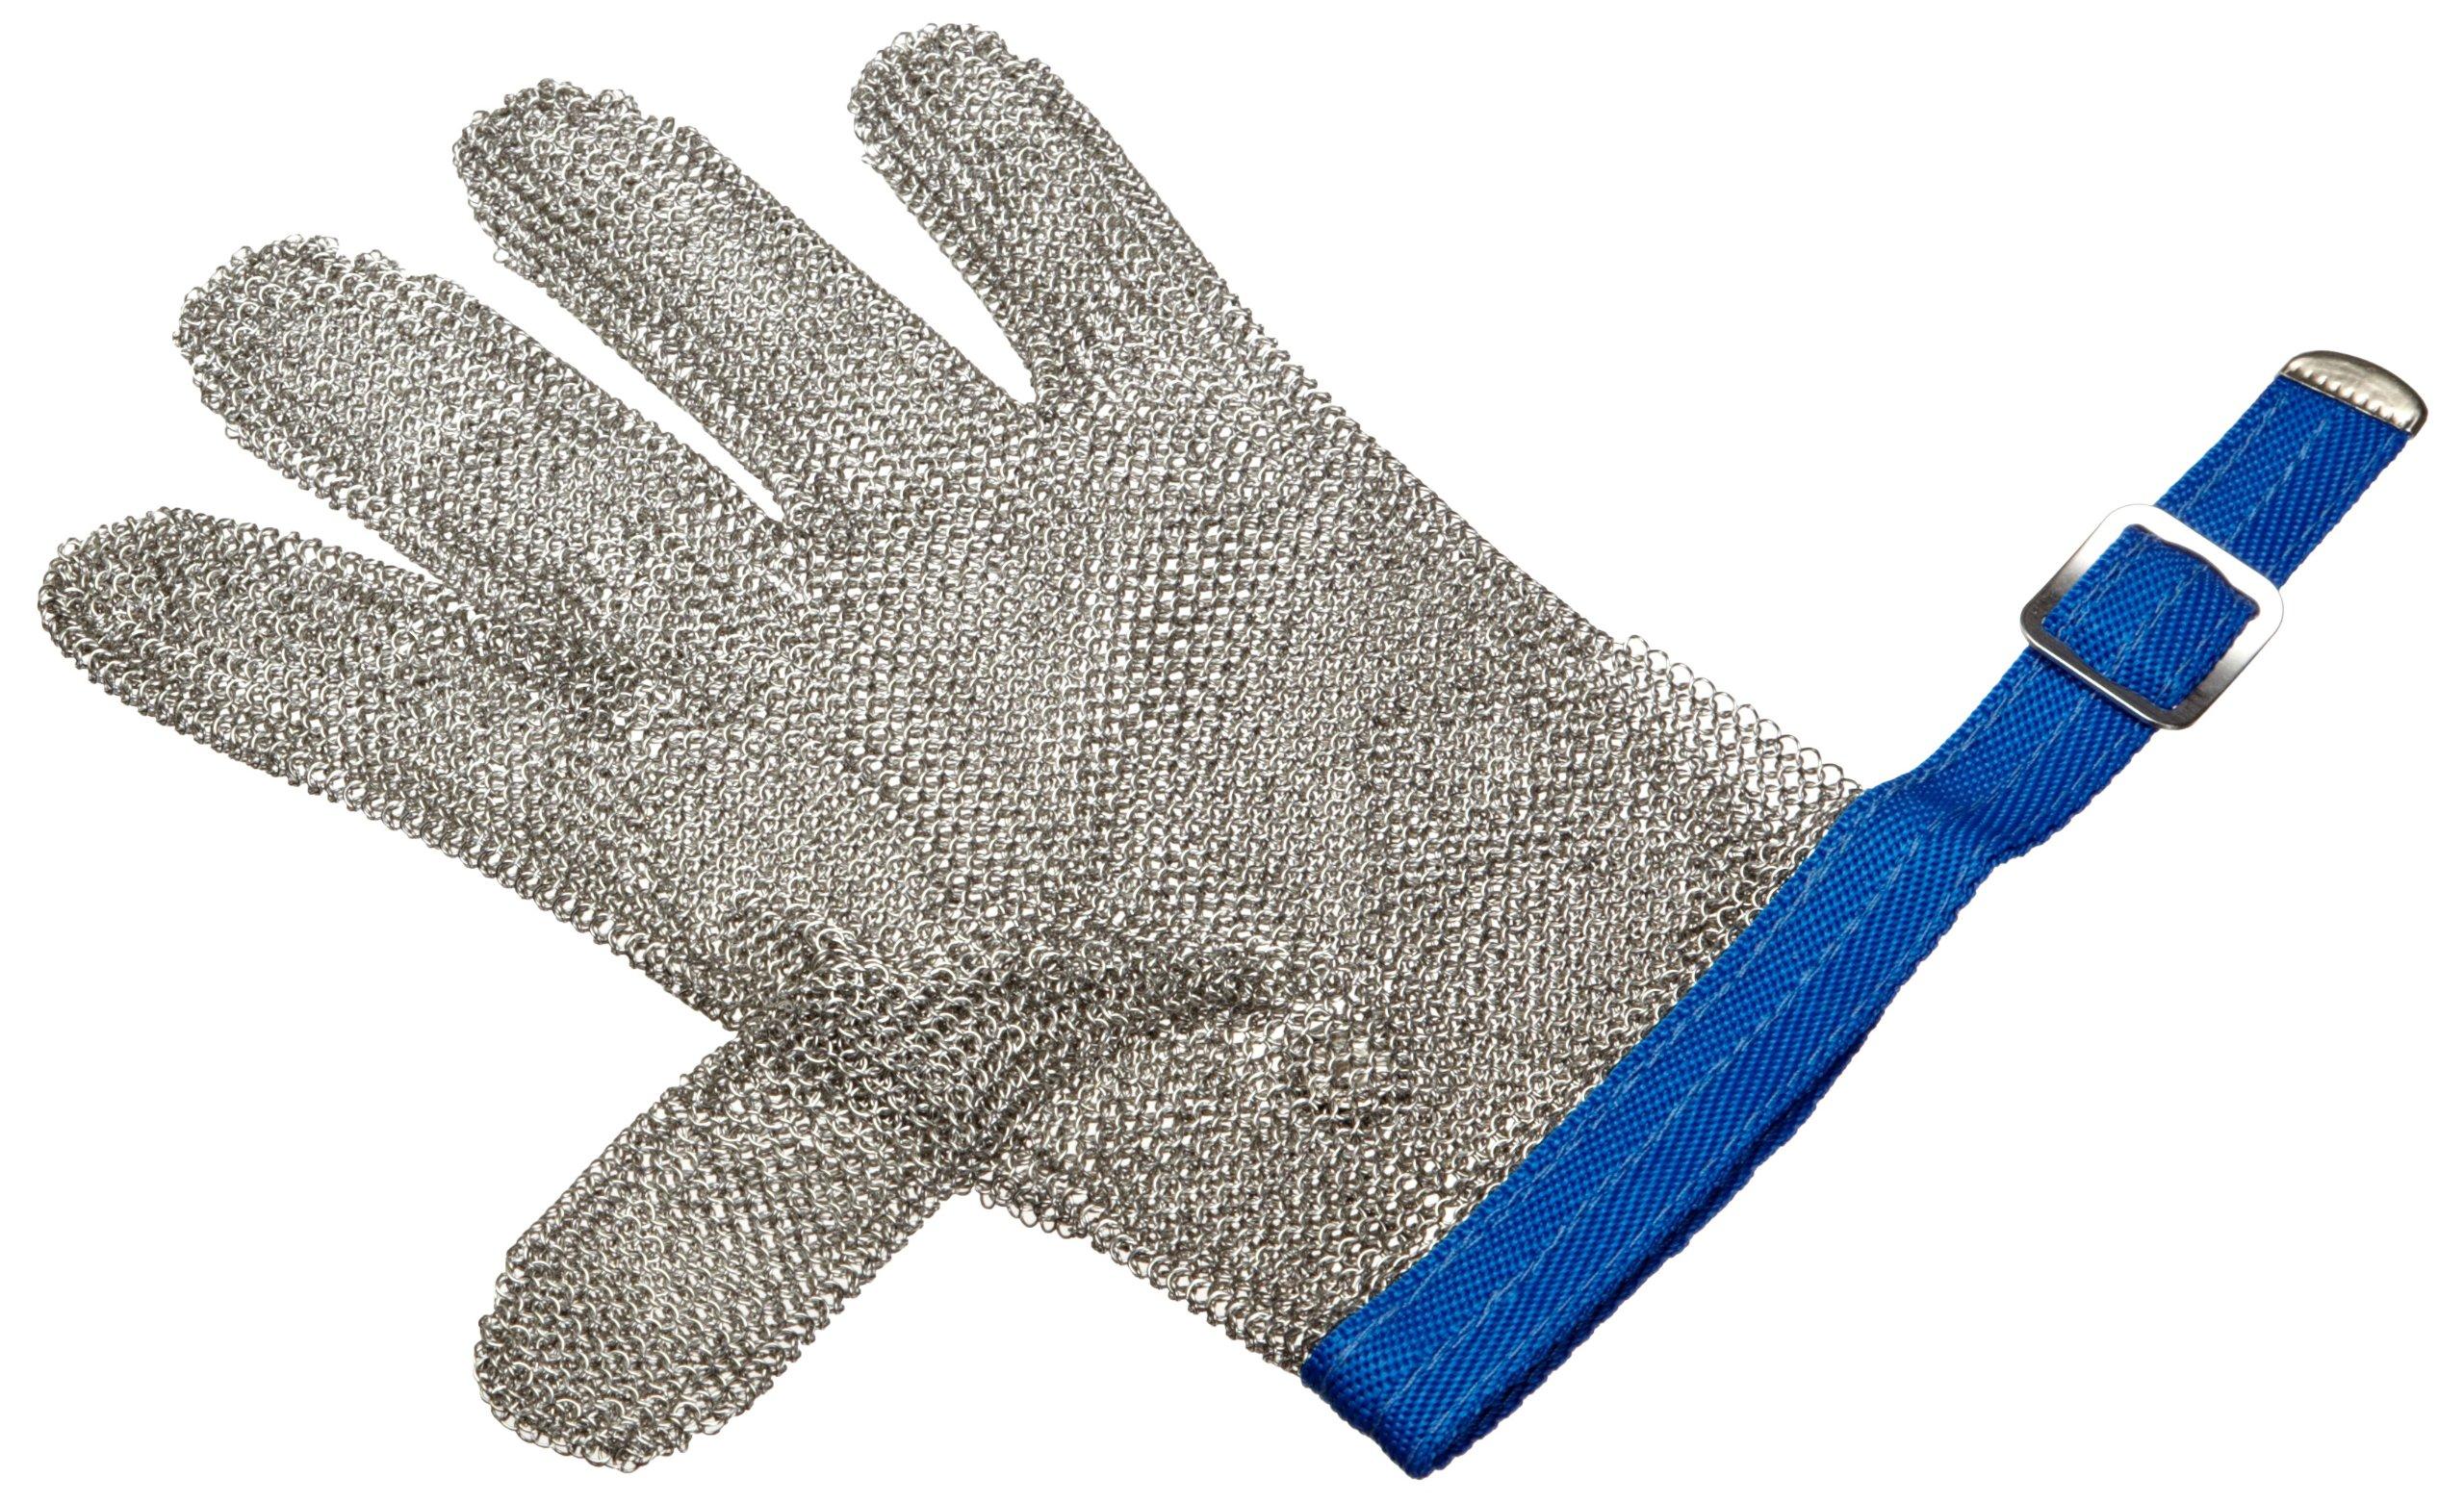 Kuchenprofi Stainless Steel Mesh Oyster Glove